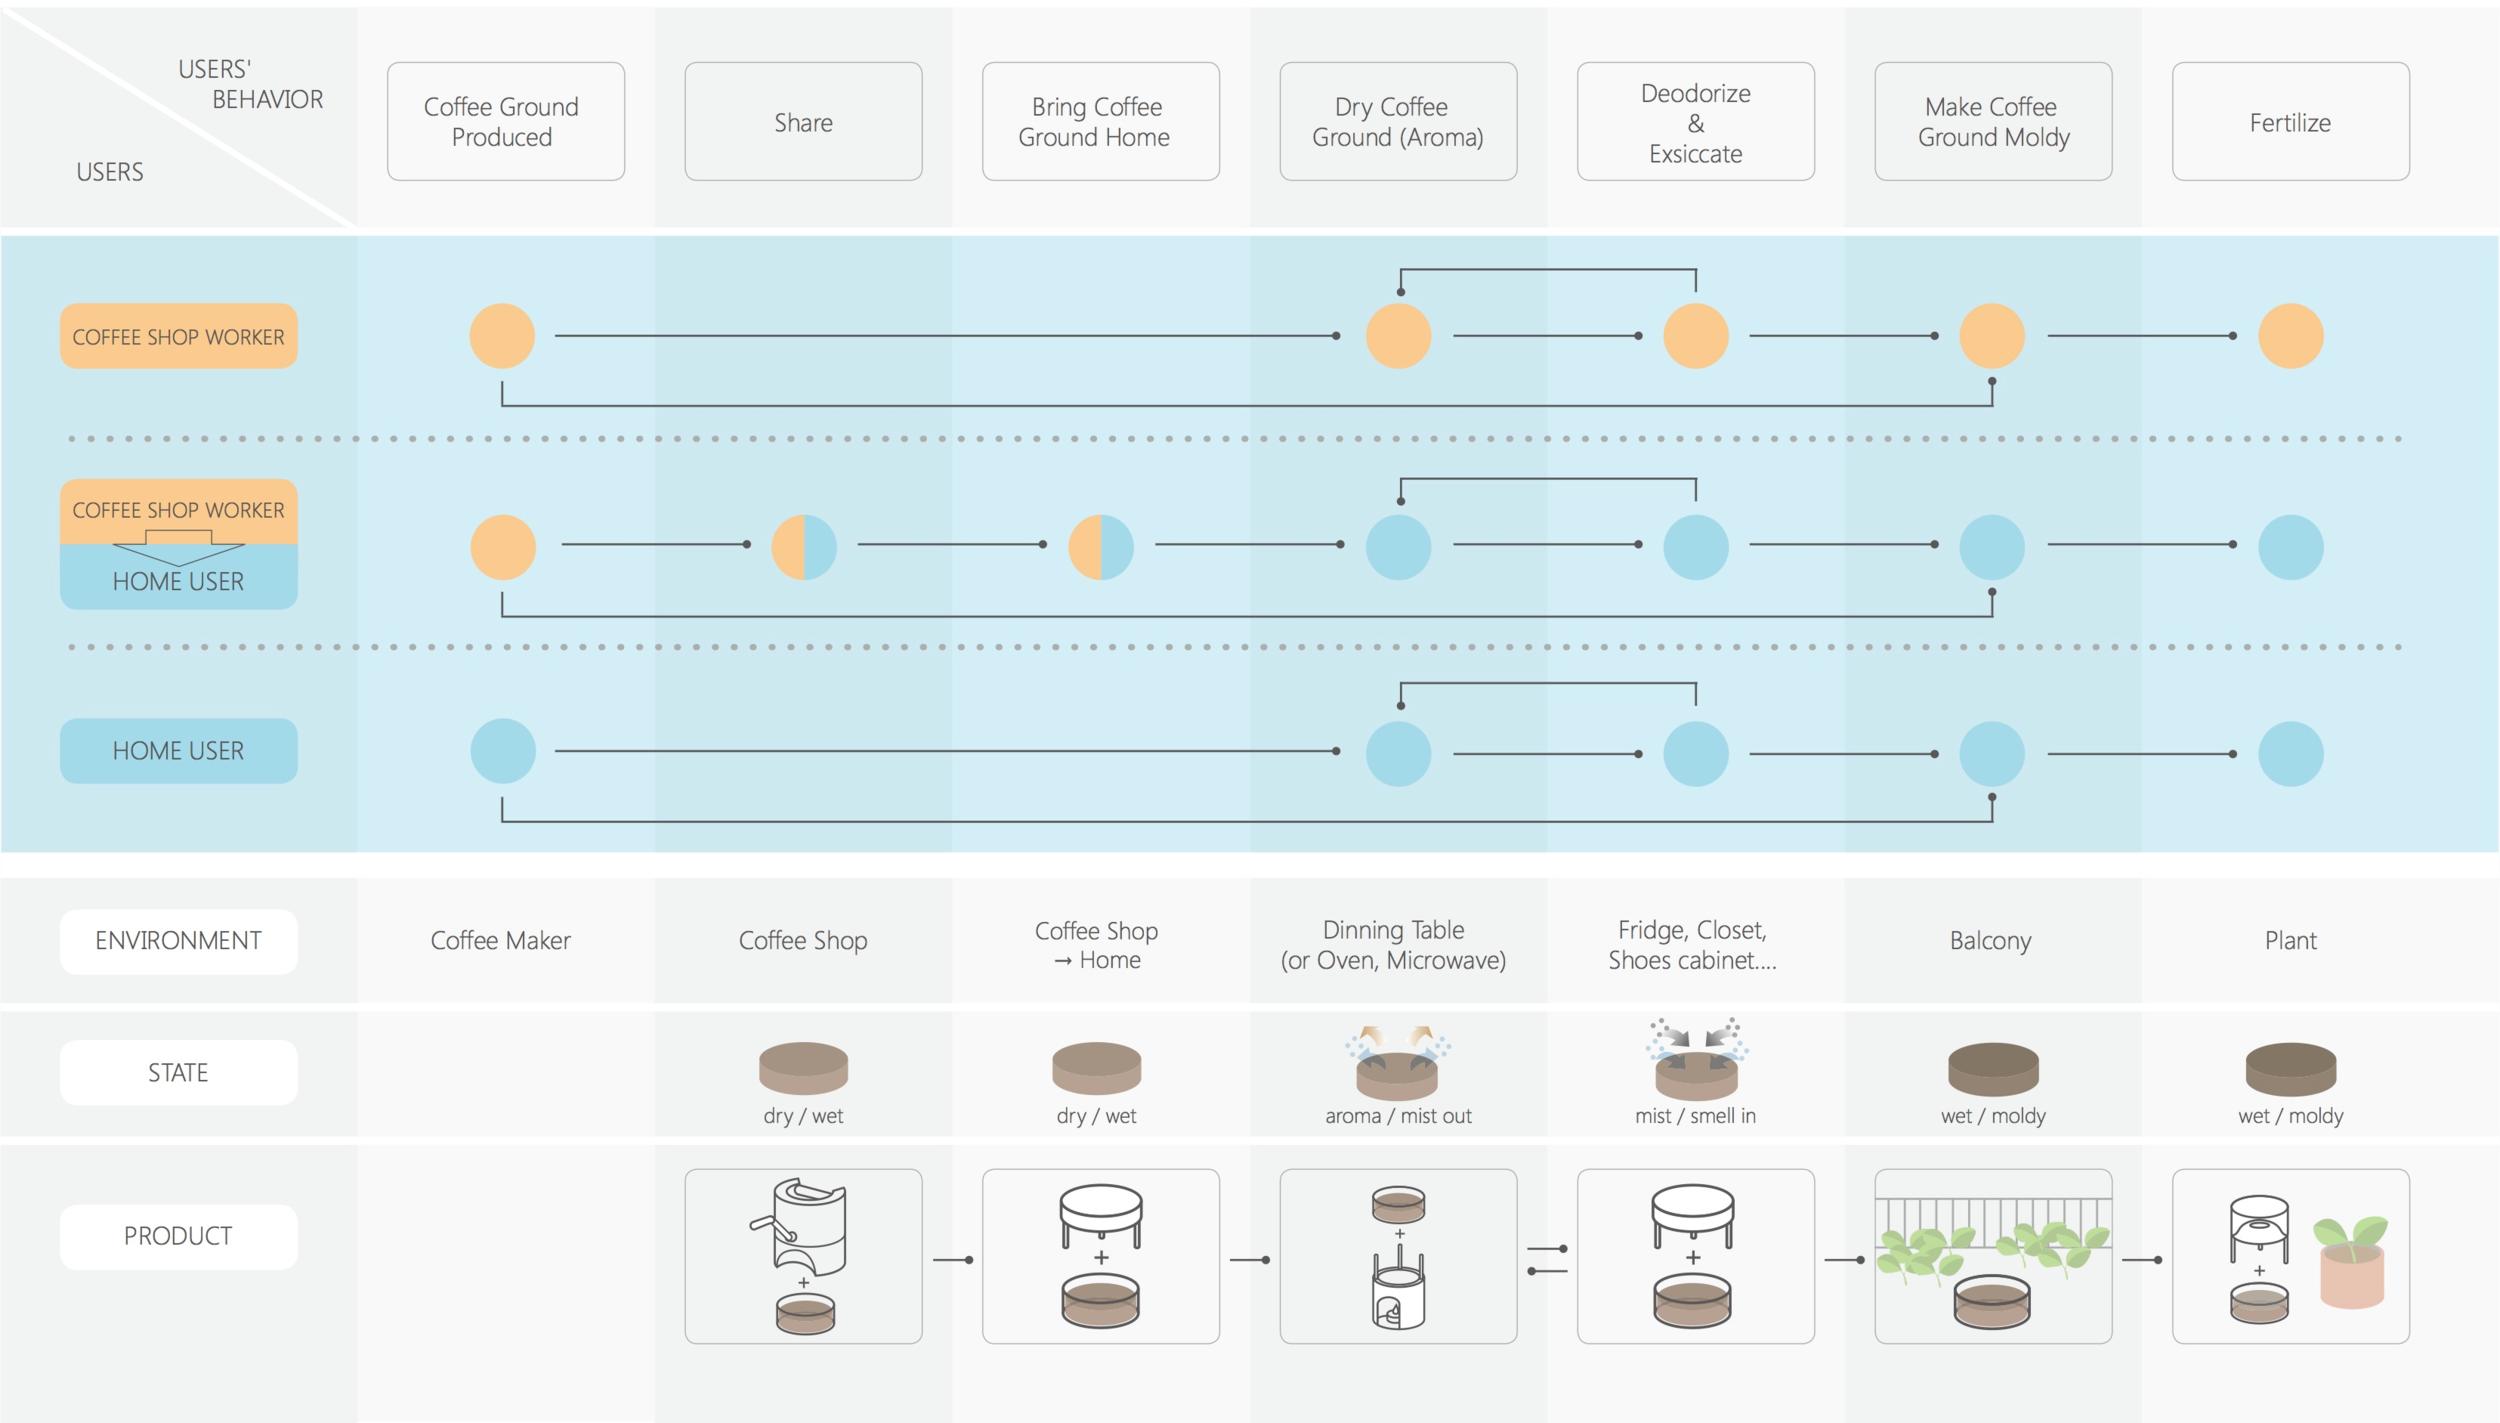 E-CO-FFEE Operational Process/ by 黃安聖 & 陸玫玲 2013